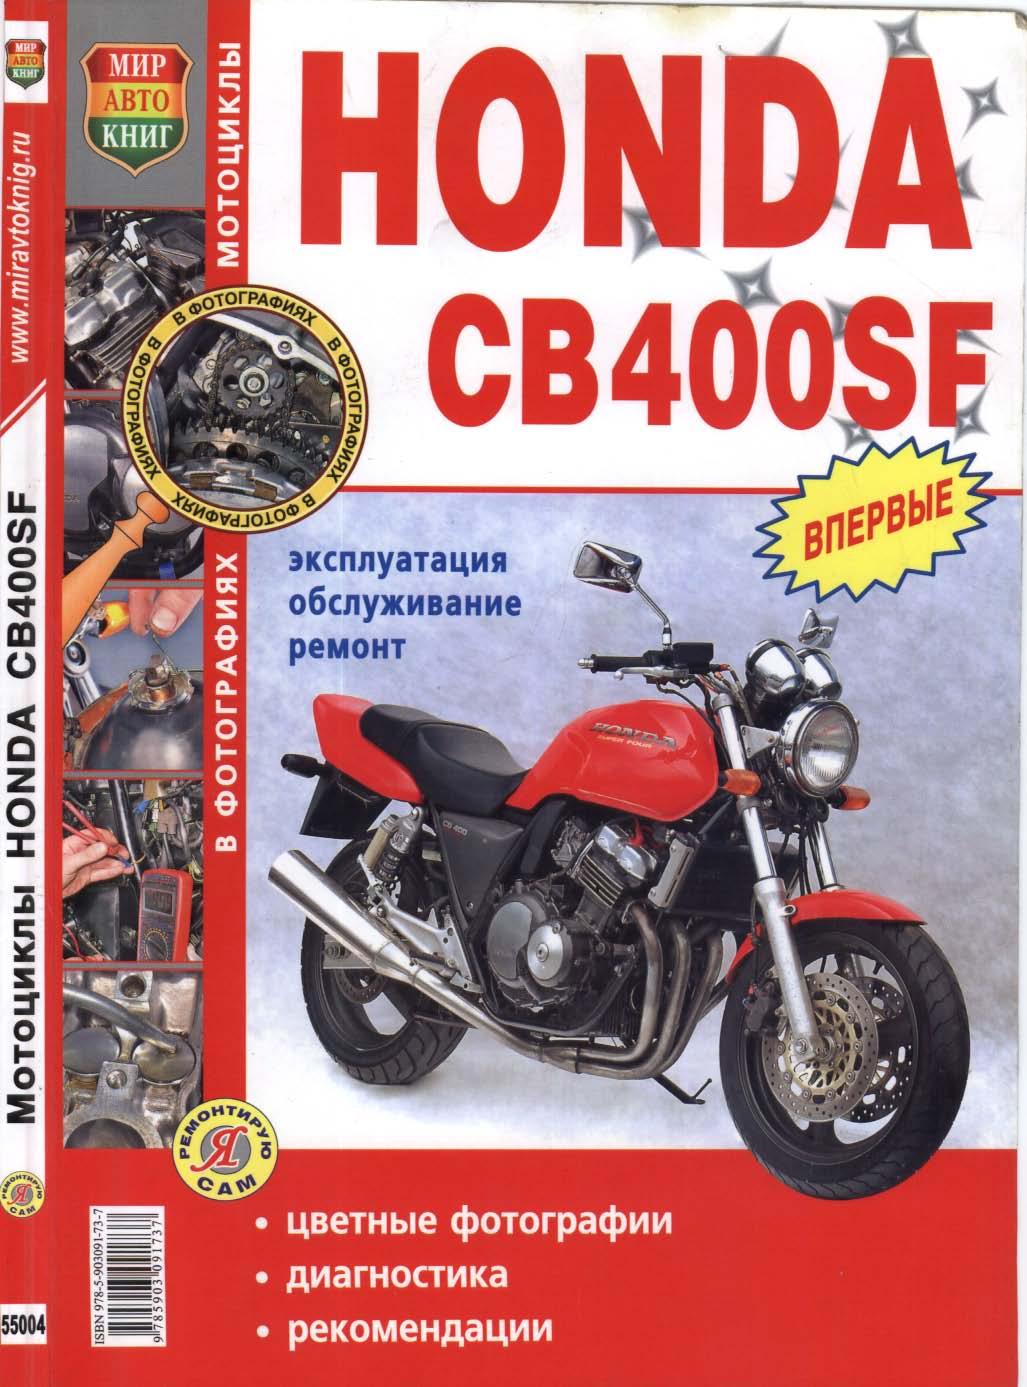 Book about the Honda CB400SF (2008) (Russian)